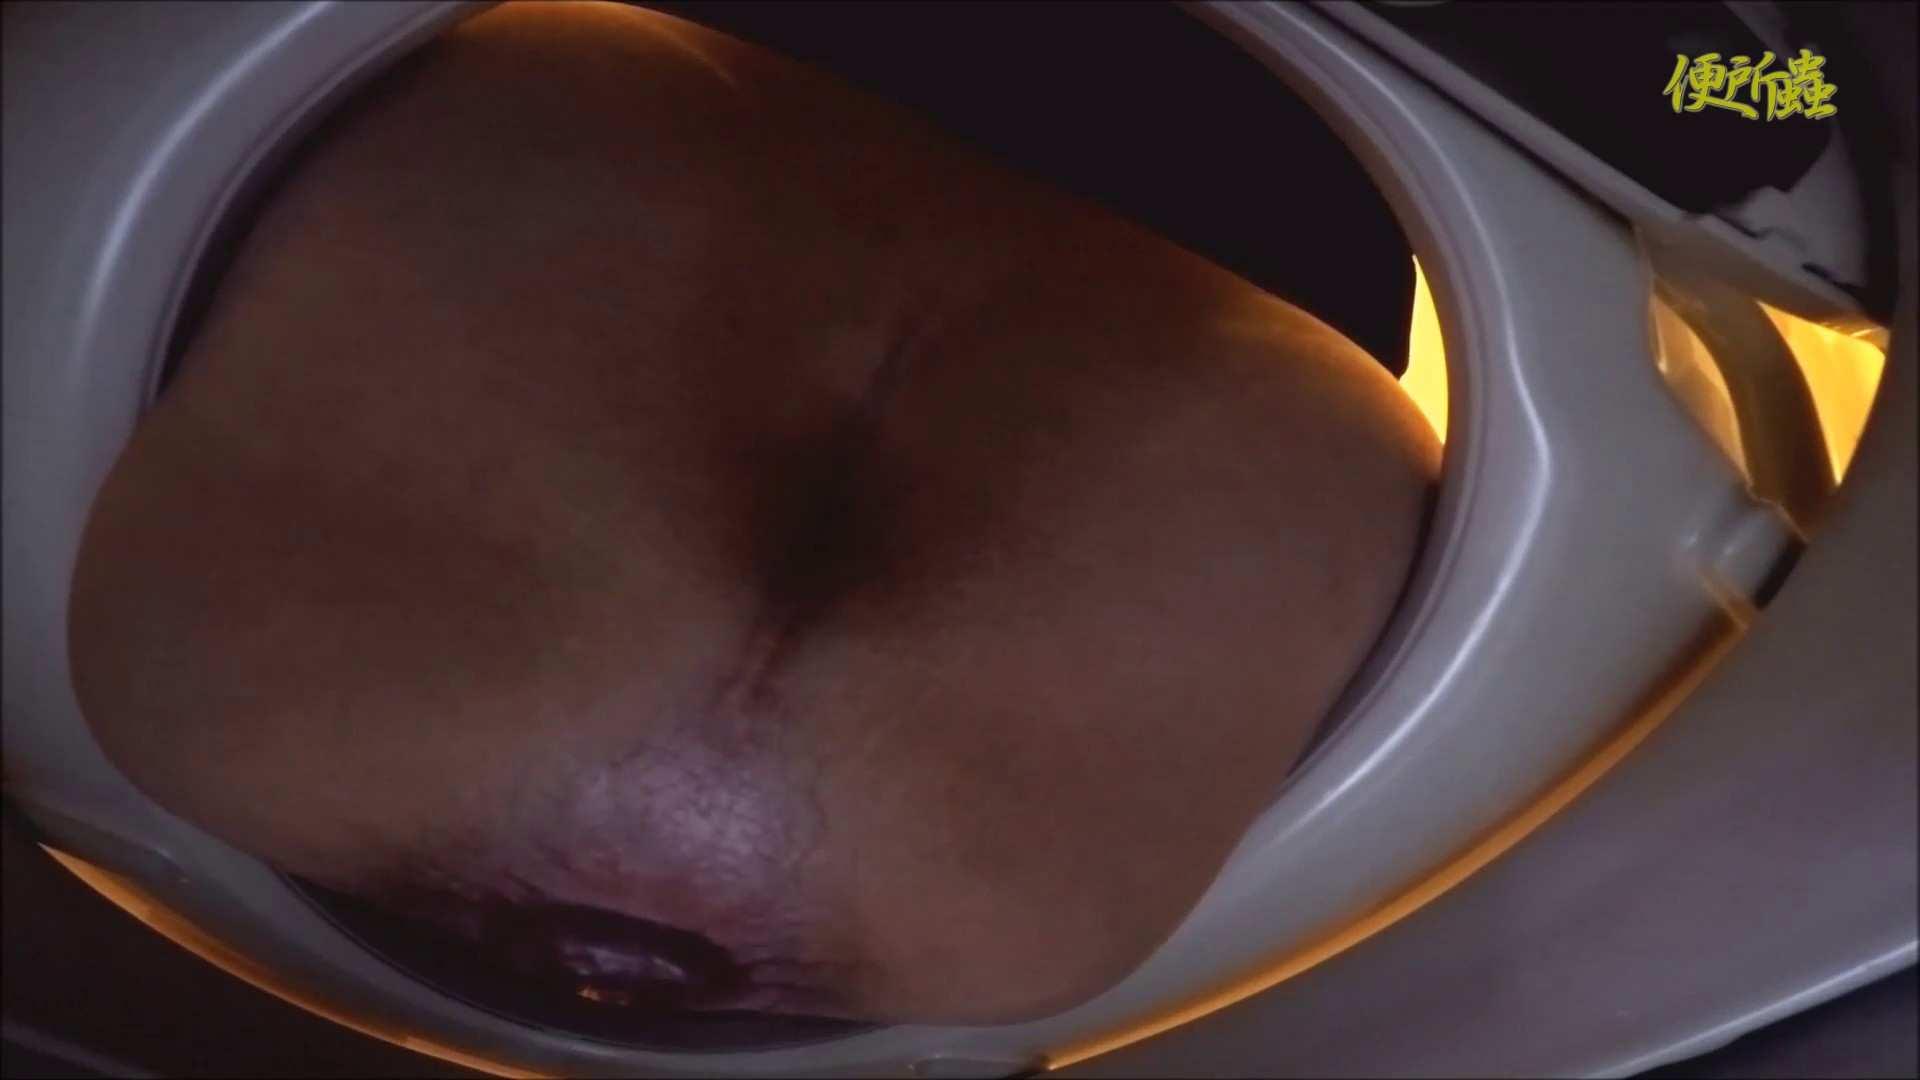 vol.04 便所蟲さんのリターン~寺子屋洗面所盗撮~ 便器 エロ画像 23画像 23